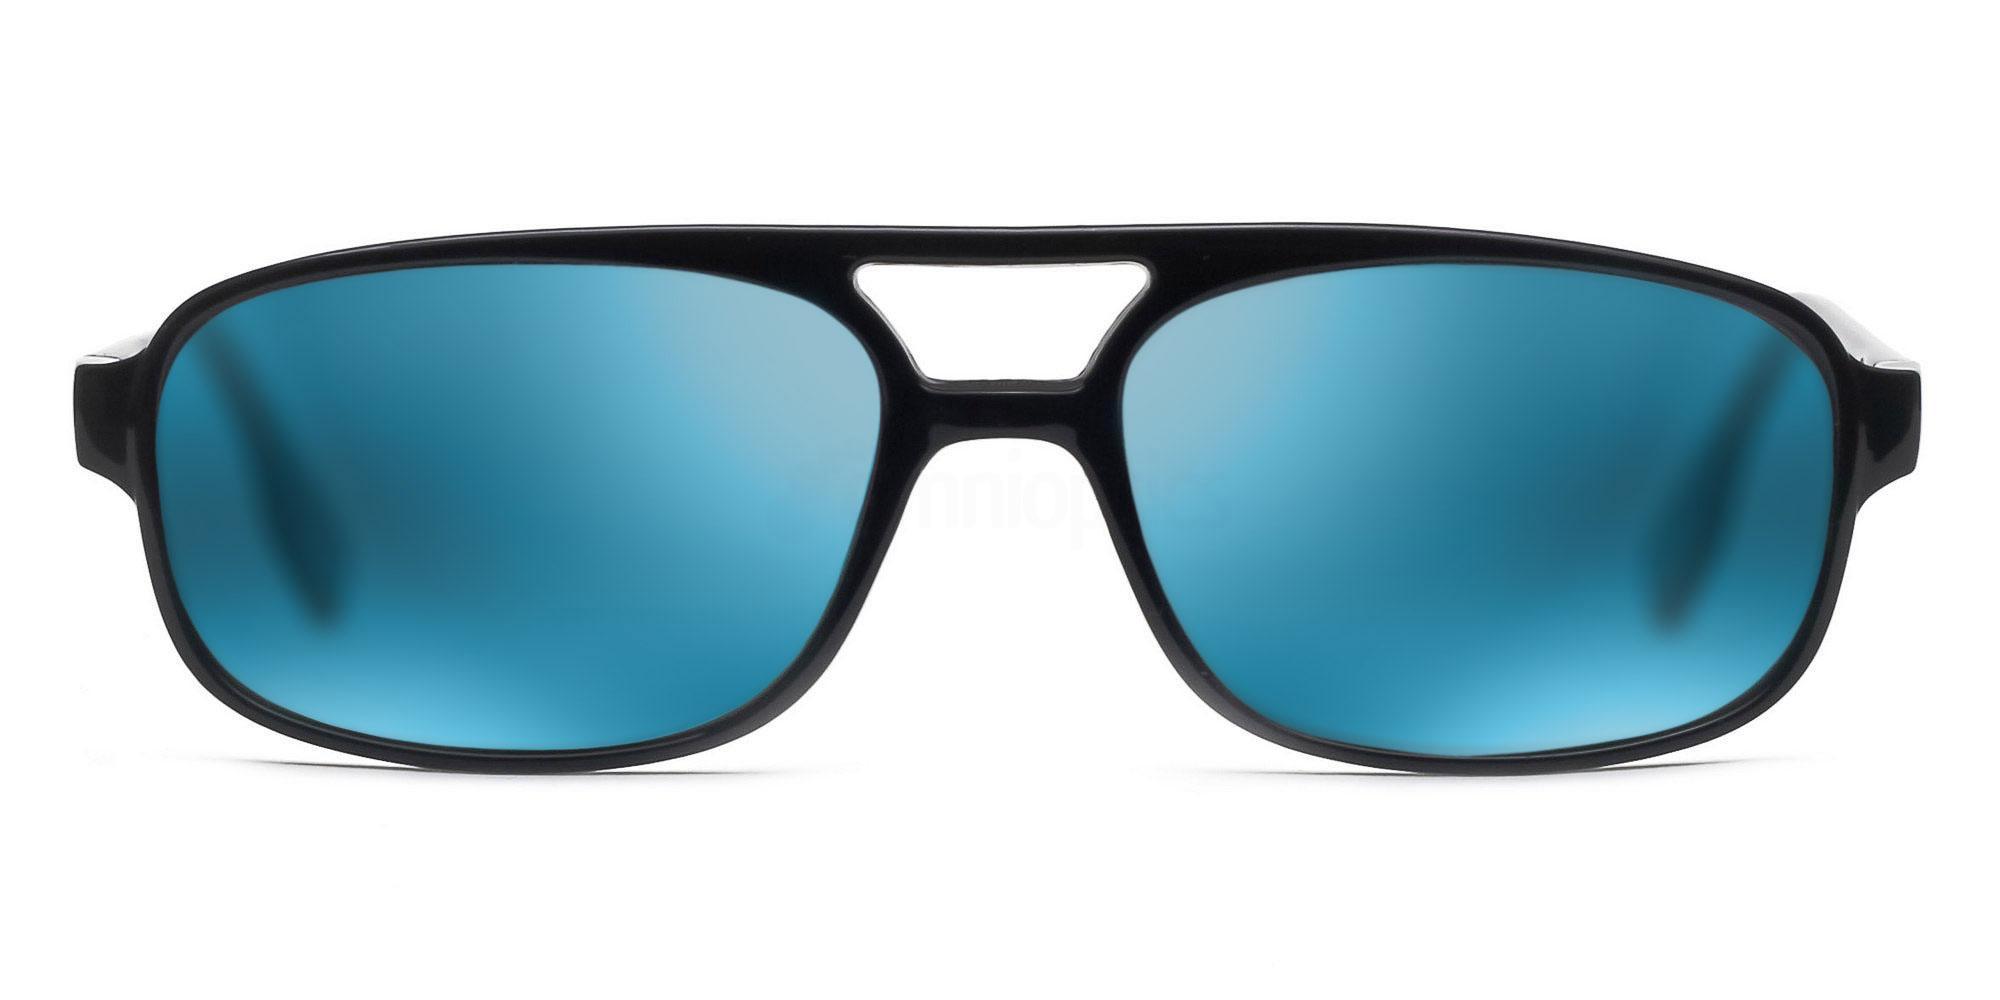 C01 Polarized Grey with Green Mirror P2395 - Black (Mirrored Polarized) Sunglasses, Savannah